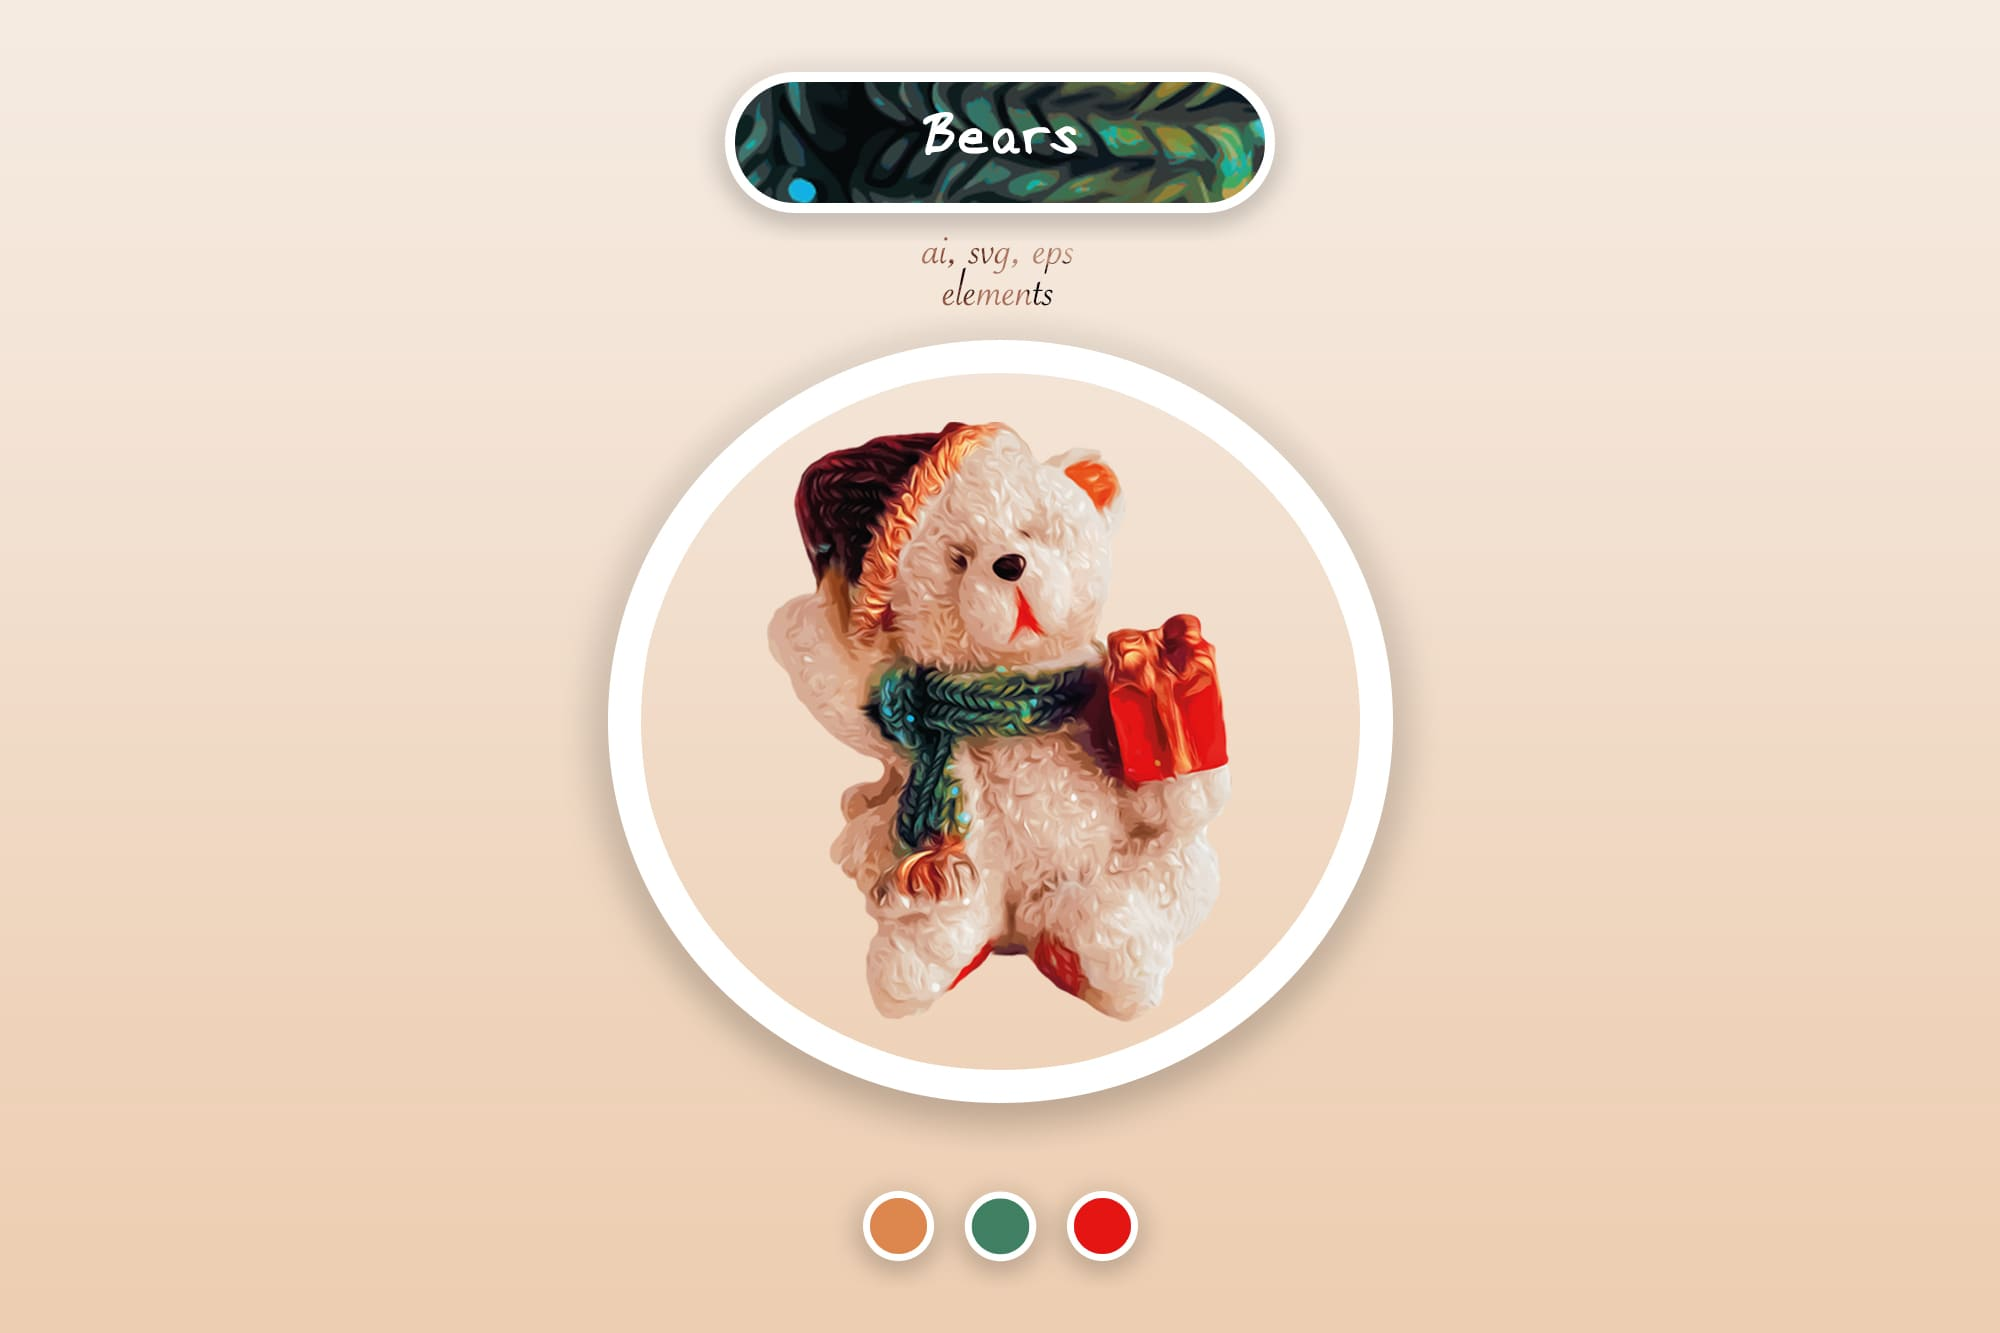 496 Christmas Illustrations: Christmas Vectors Bundle SVG, EPS, AI - Bears 2a